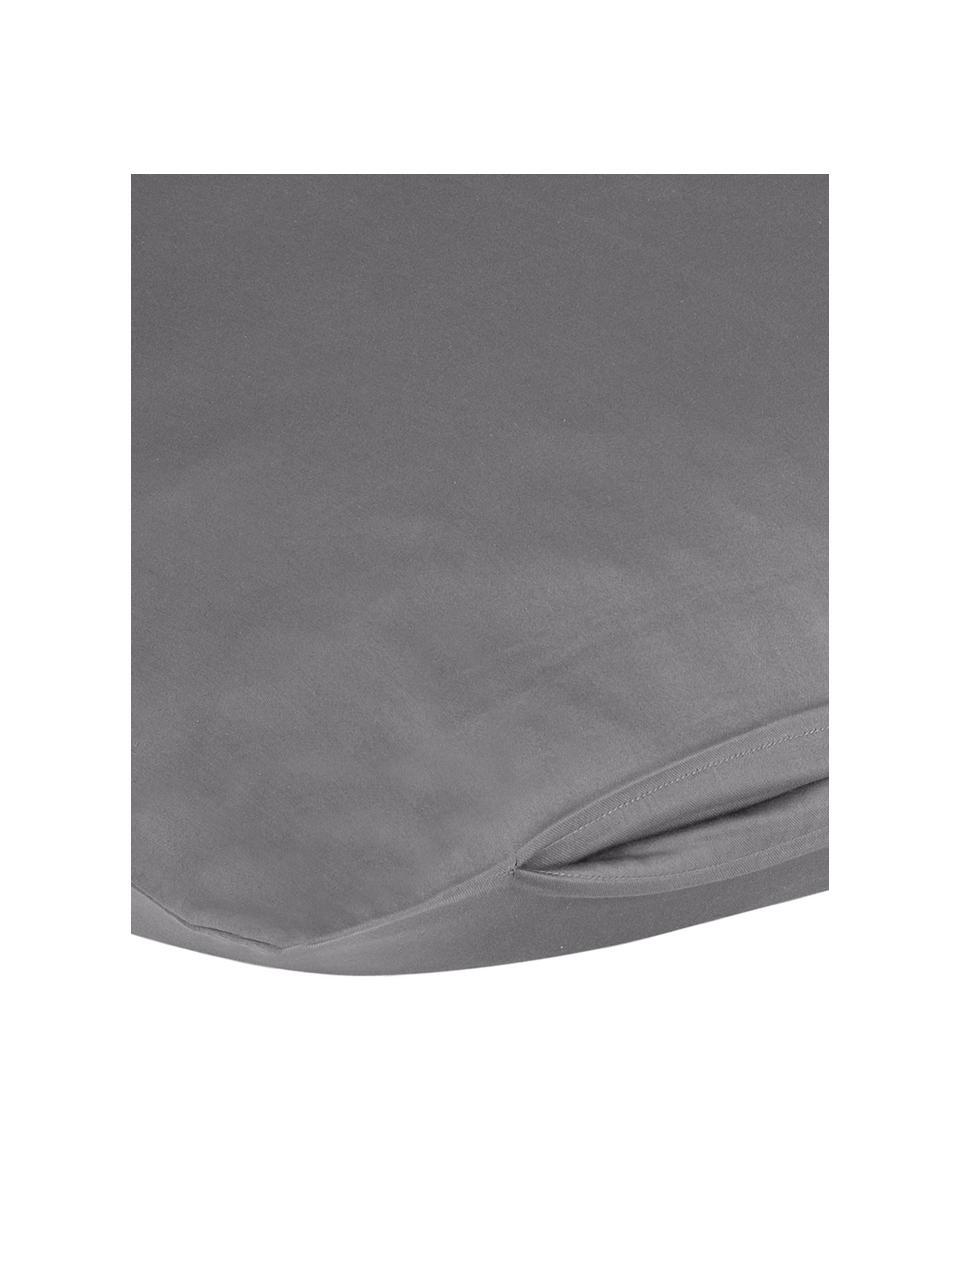 Baumwollsatin-Kopfkissenbezüge Comfort in Dunkelgrau, 2 Stück, Webart: Satin Fadendichte 250 TC,, Dunkelgrau, 40 x 80 cm